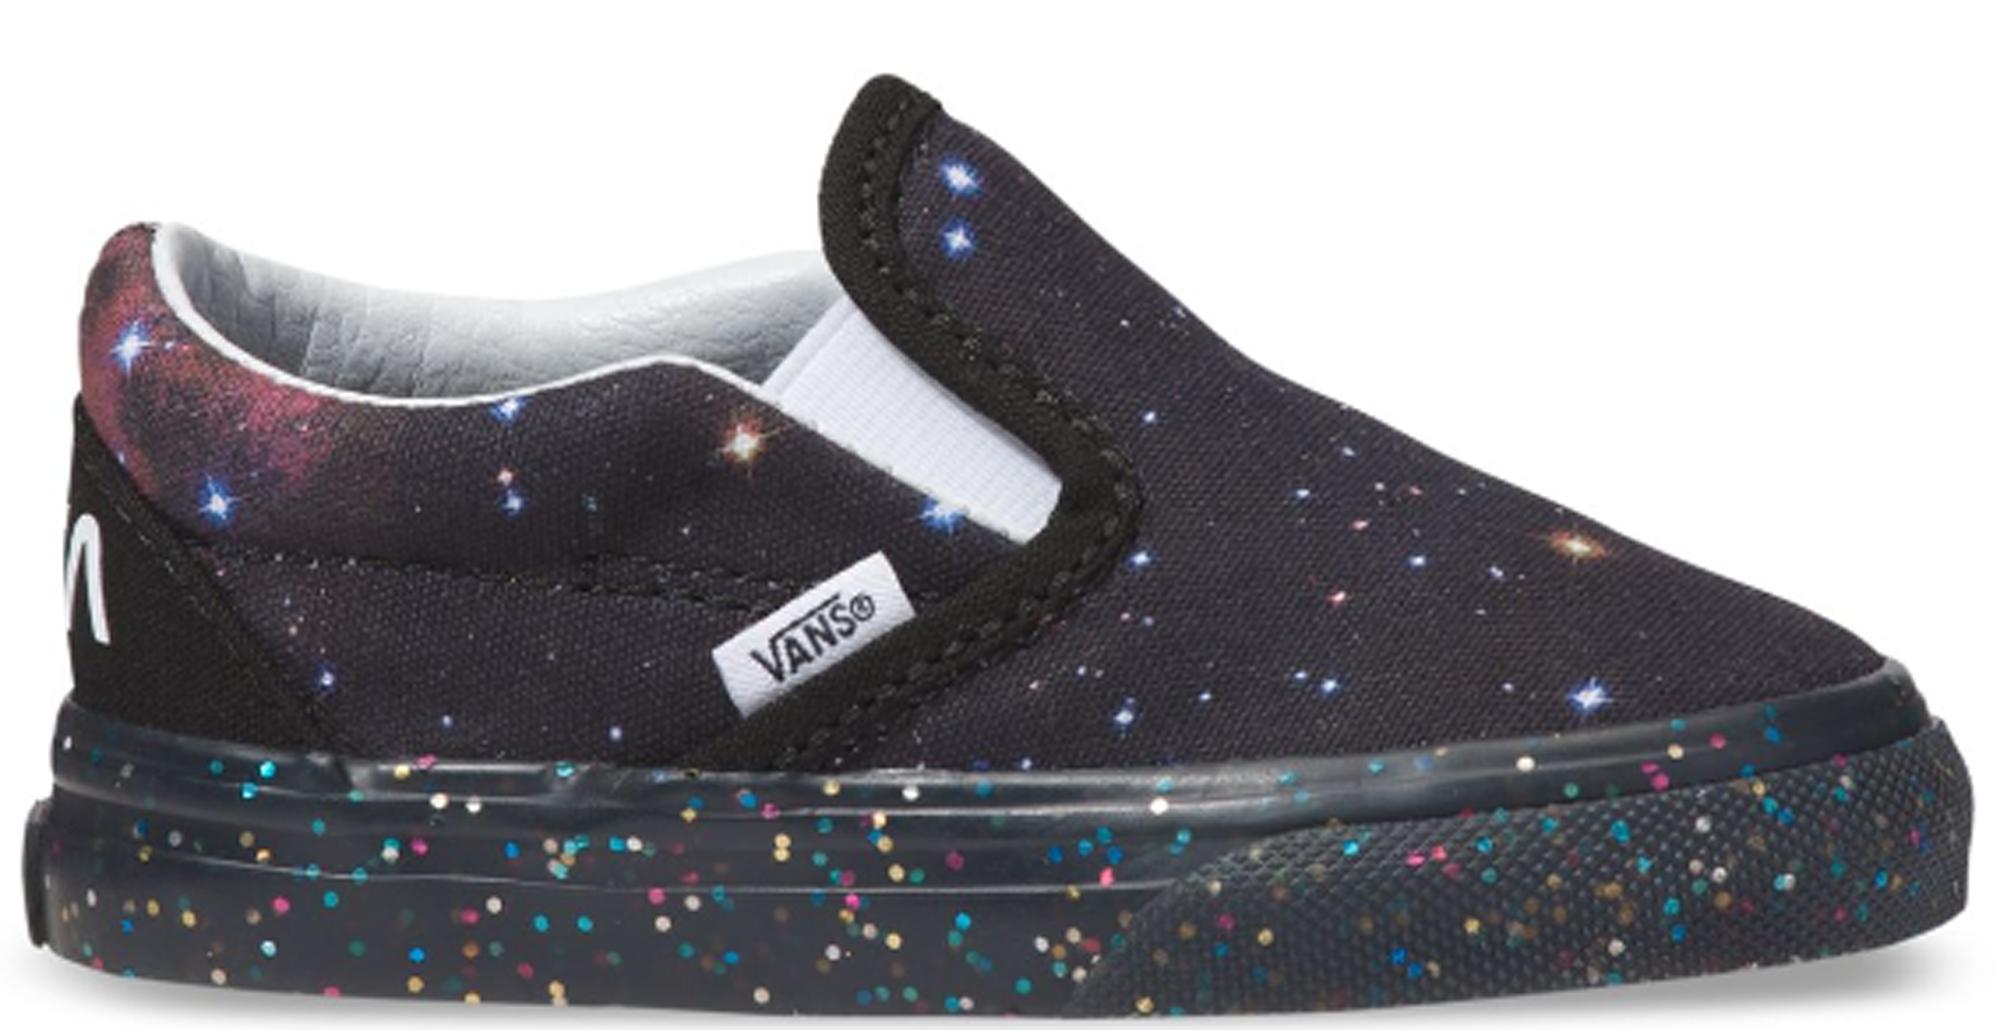 Vans Slip-On NASA Space Voyager Galaxy